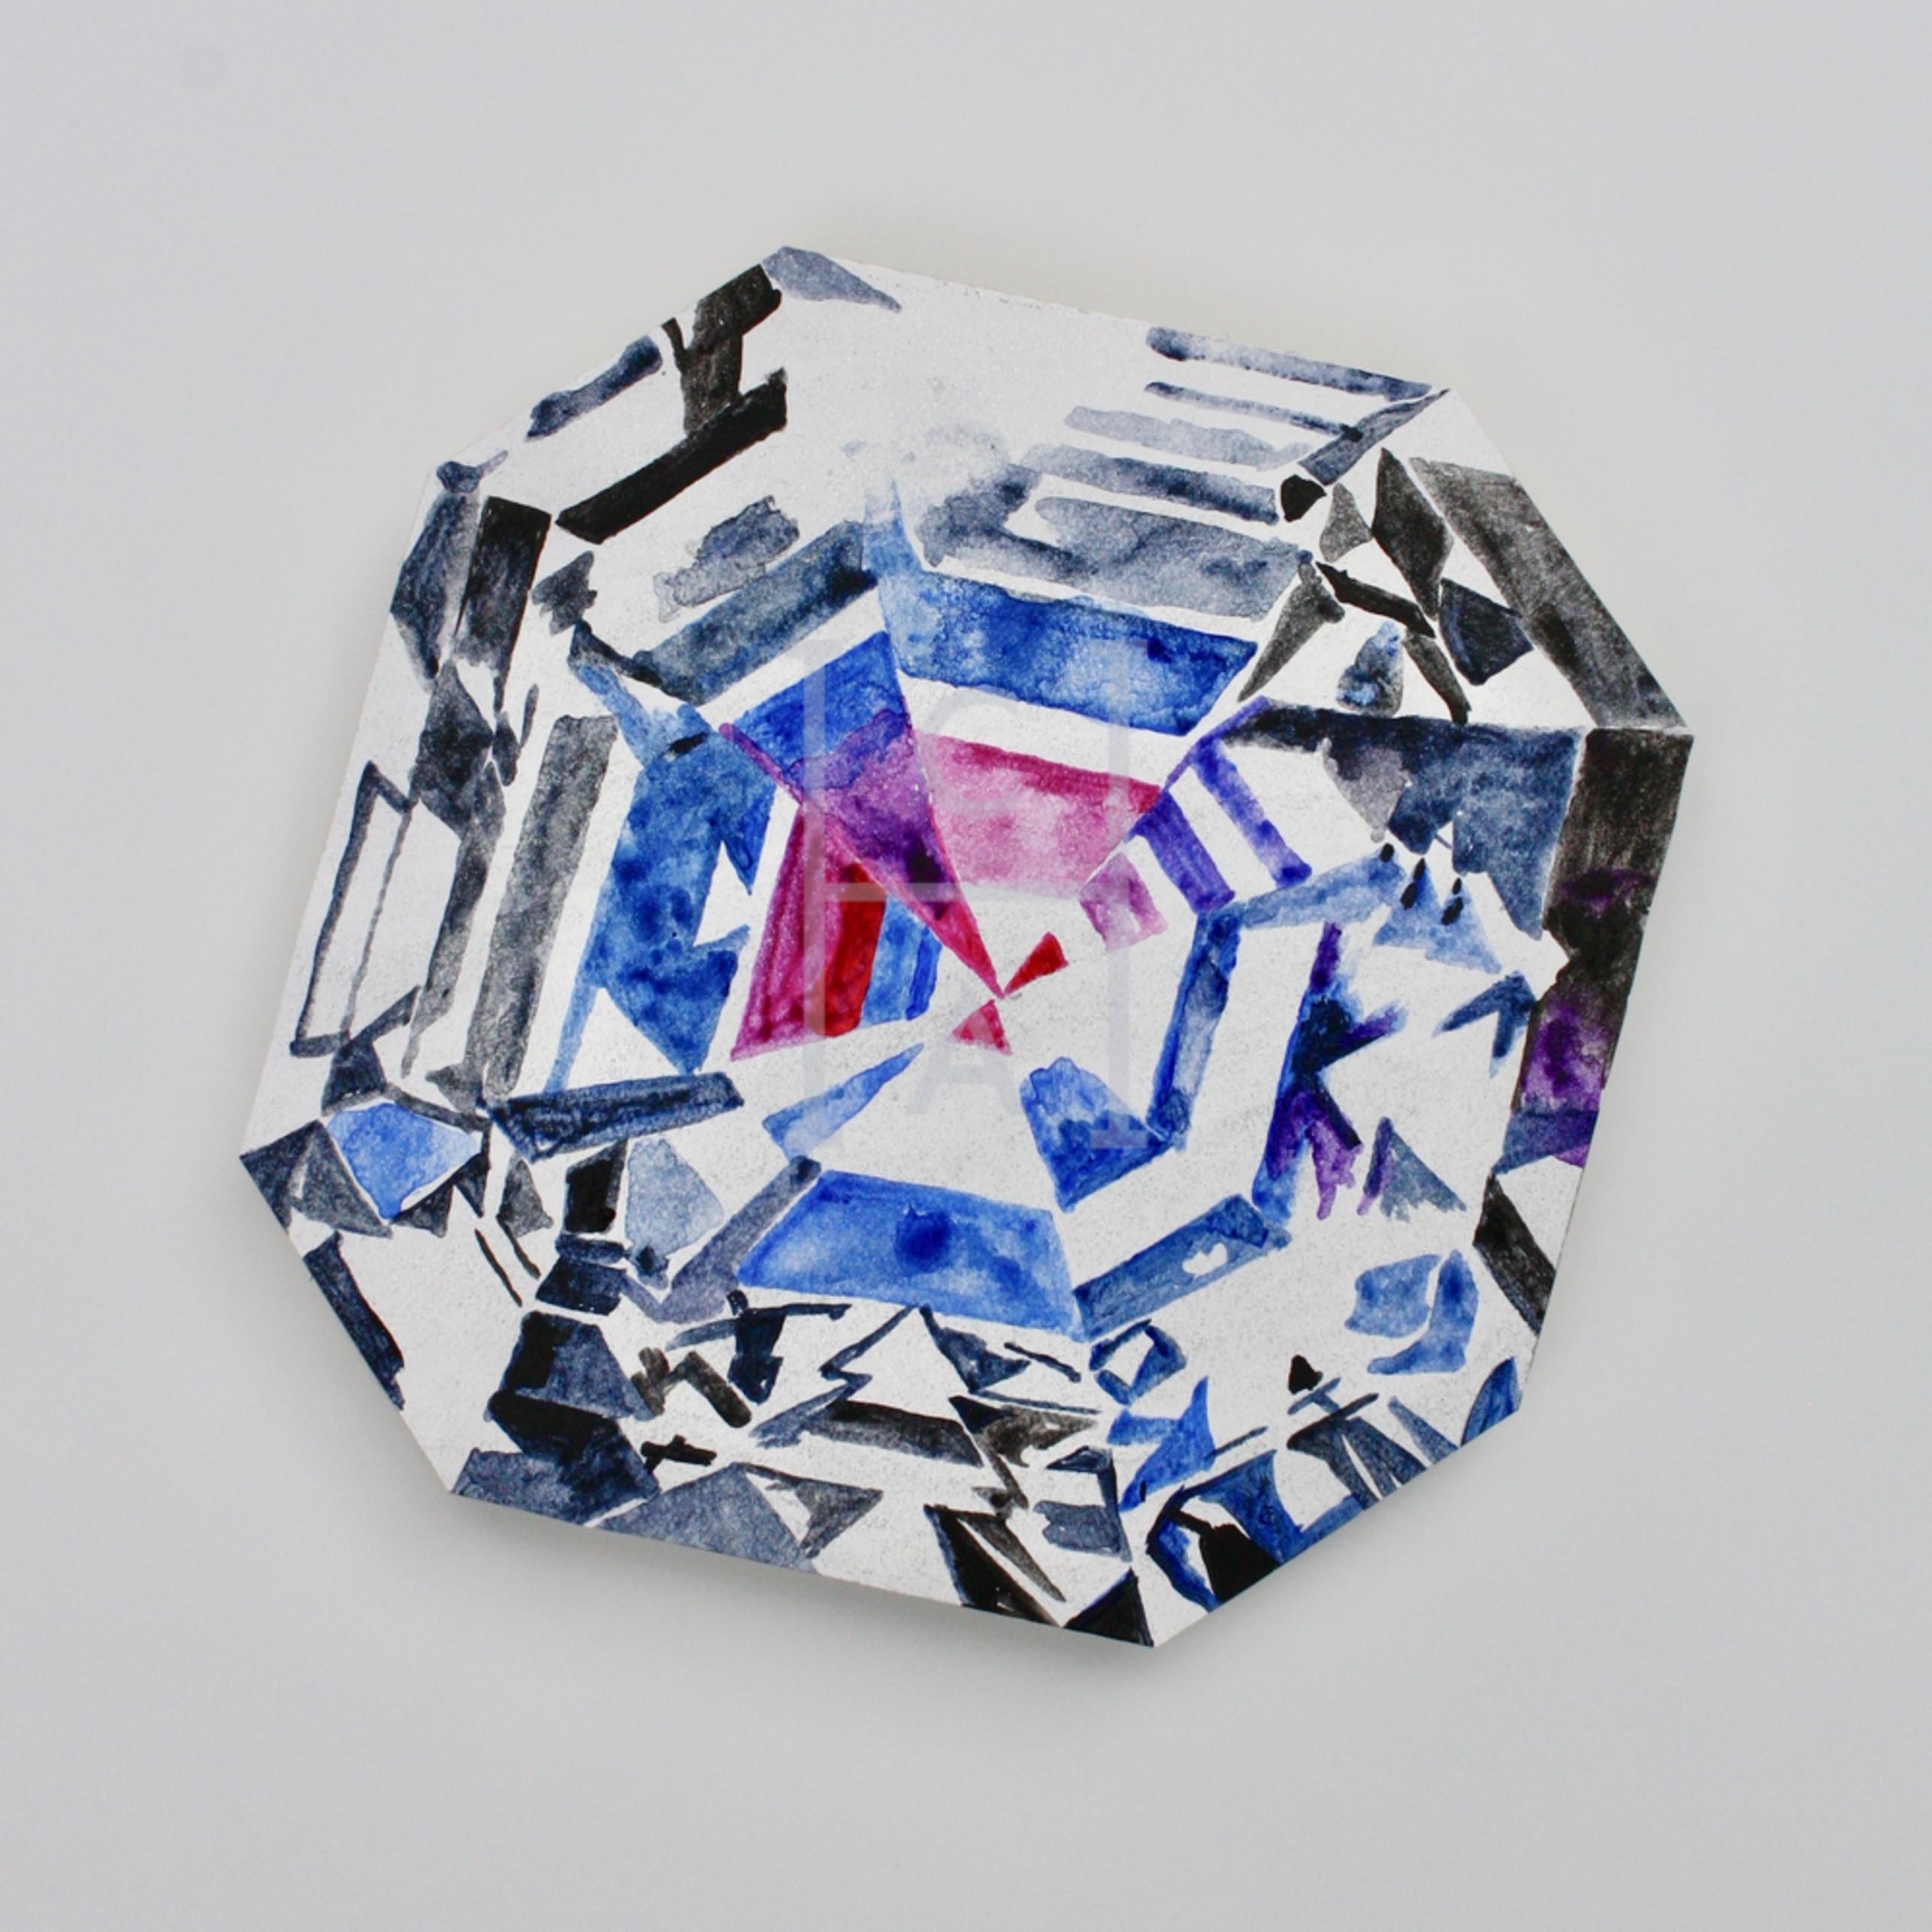 Jyothi asscher cut diamond acrylic and diamond dust on plexiglas m8bqxg